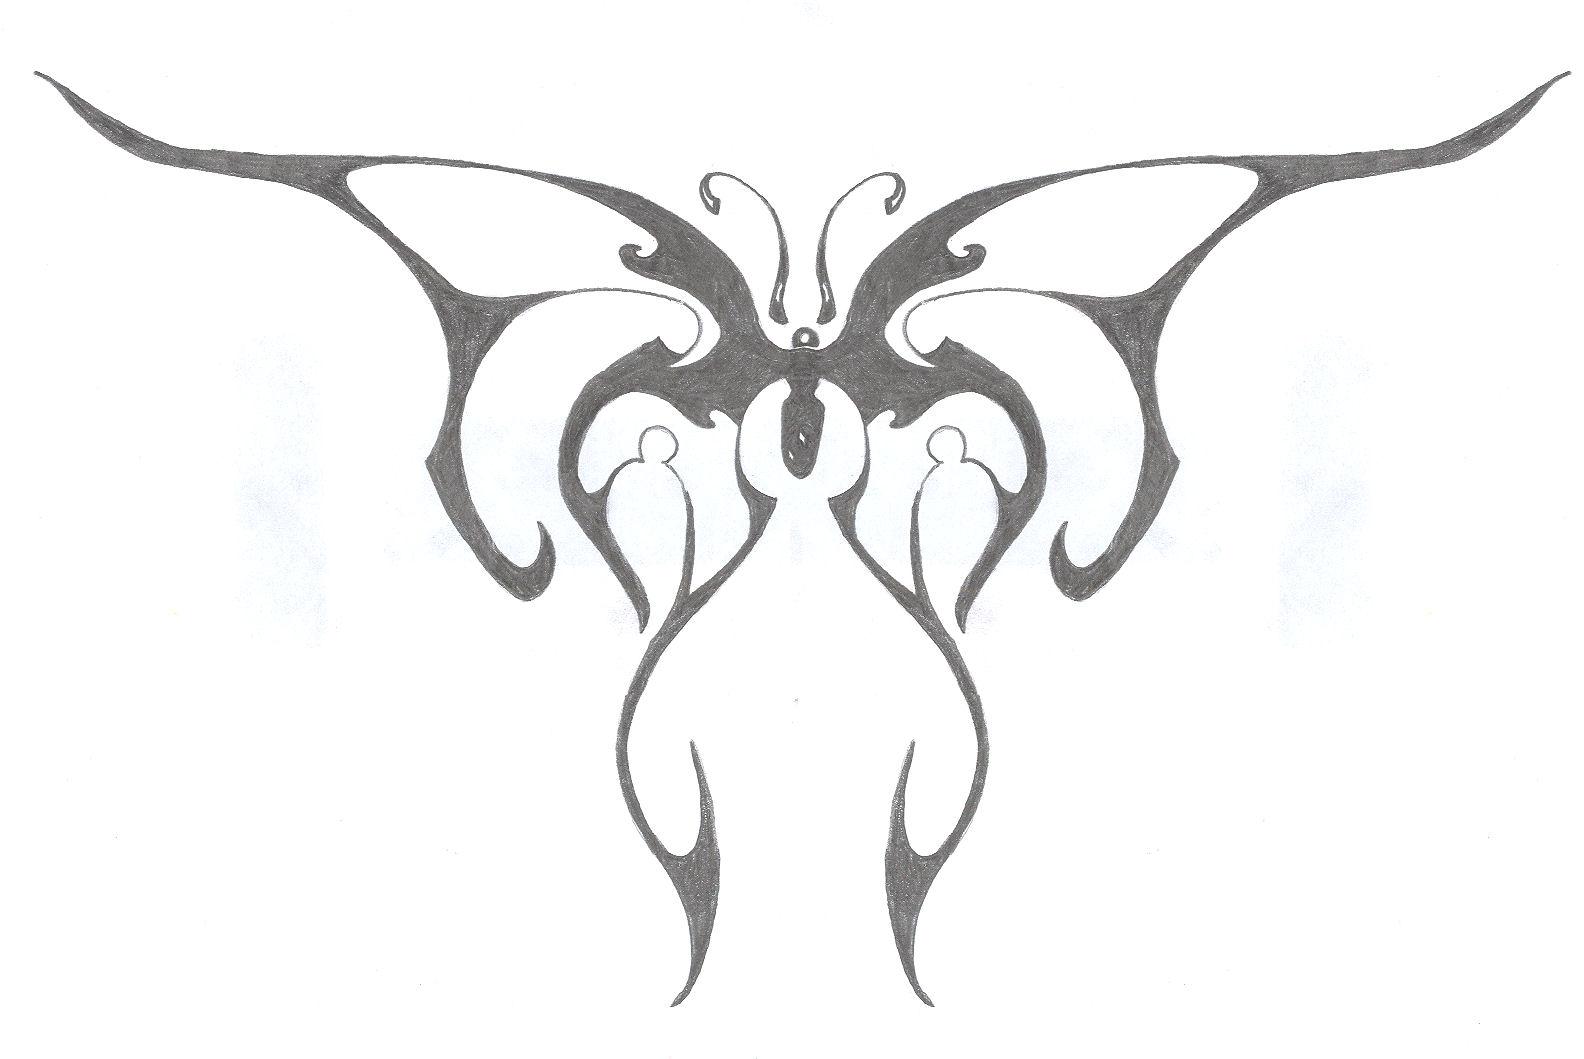 Tribal butterfly by brkensilenz on deviantart for Cool drawings of butterflies